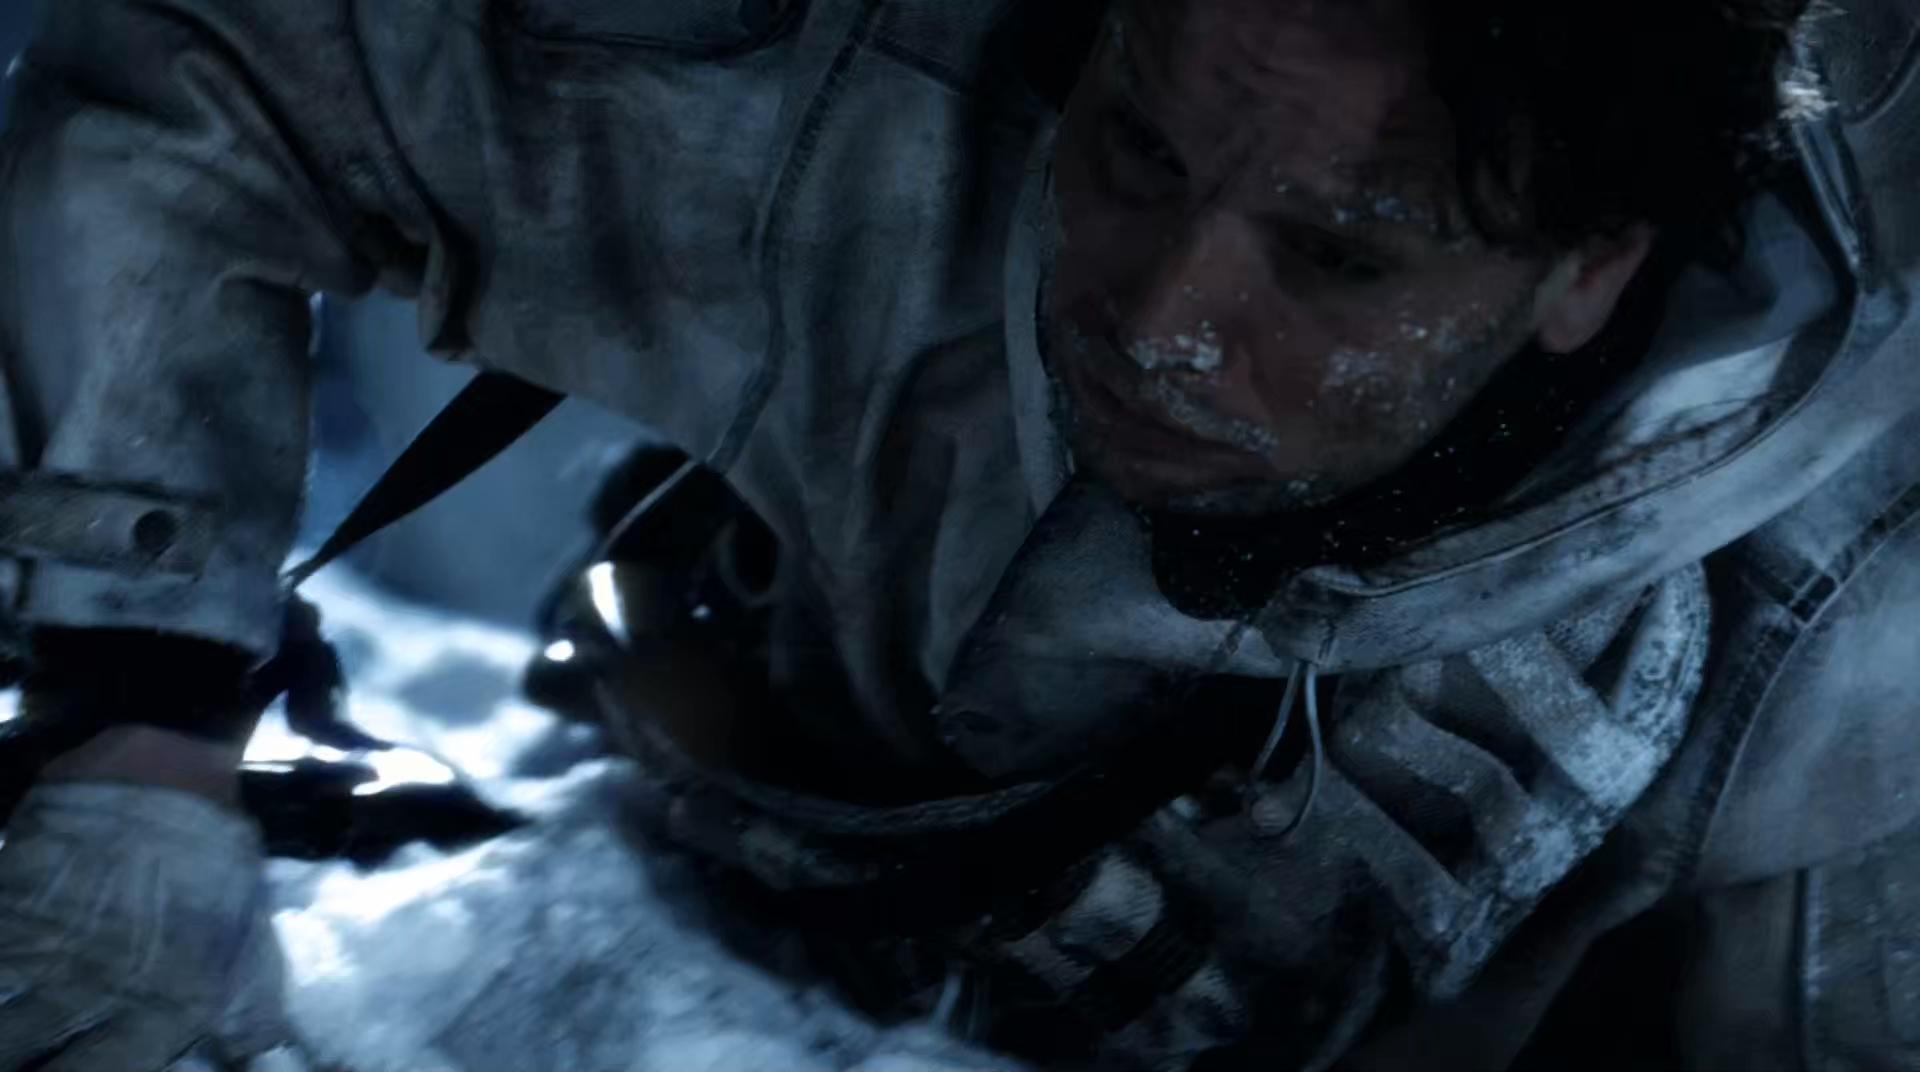 Battlestar Galactica Blood And Chrome 2012 BluRay 1080p Dts HEVC-d3g.mkv_snapshot_00.56.05.000.jpg